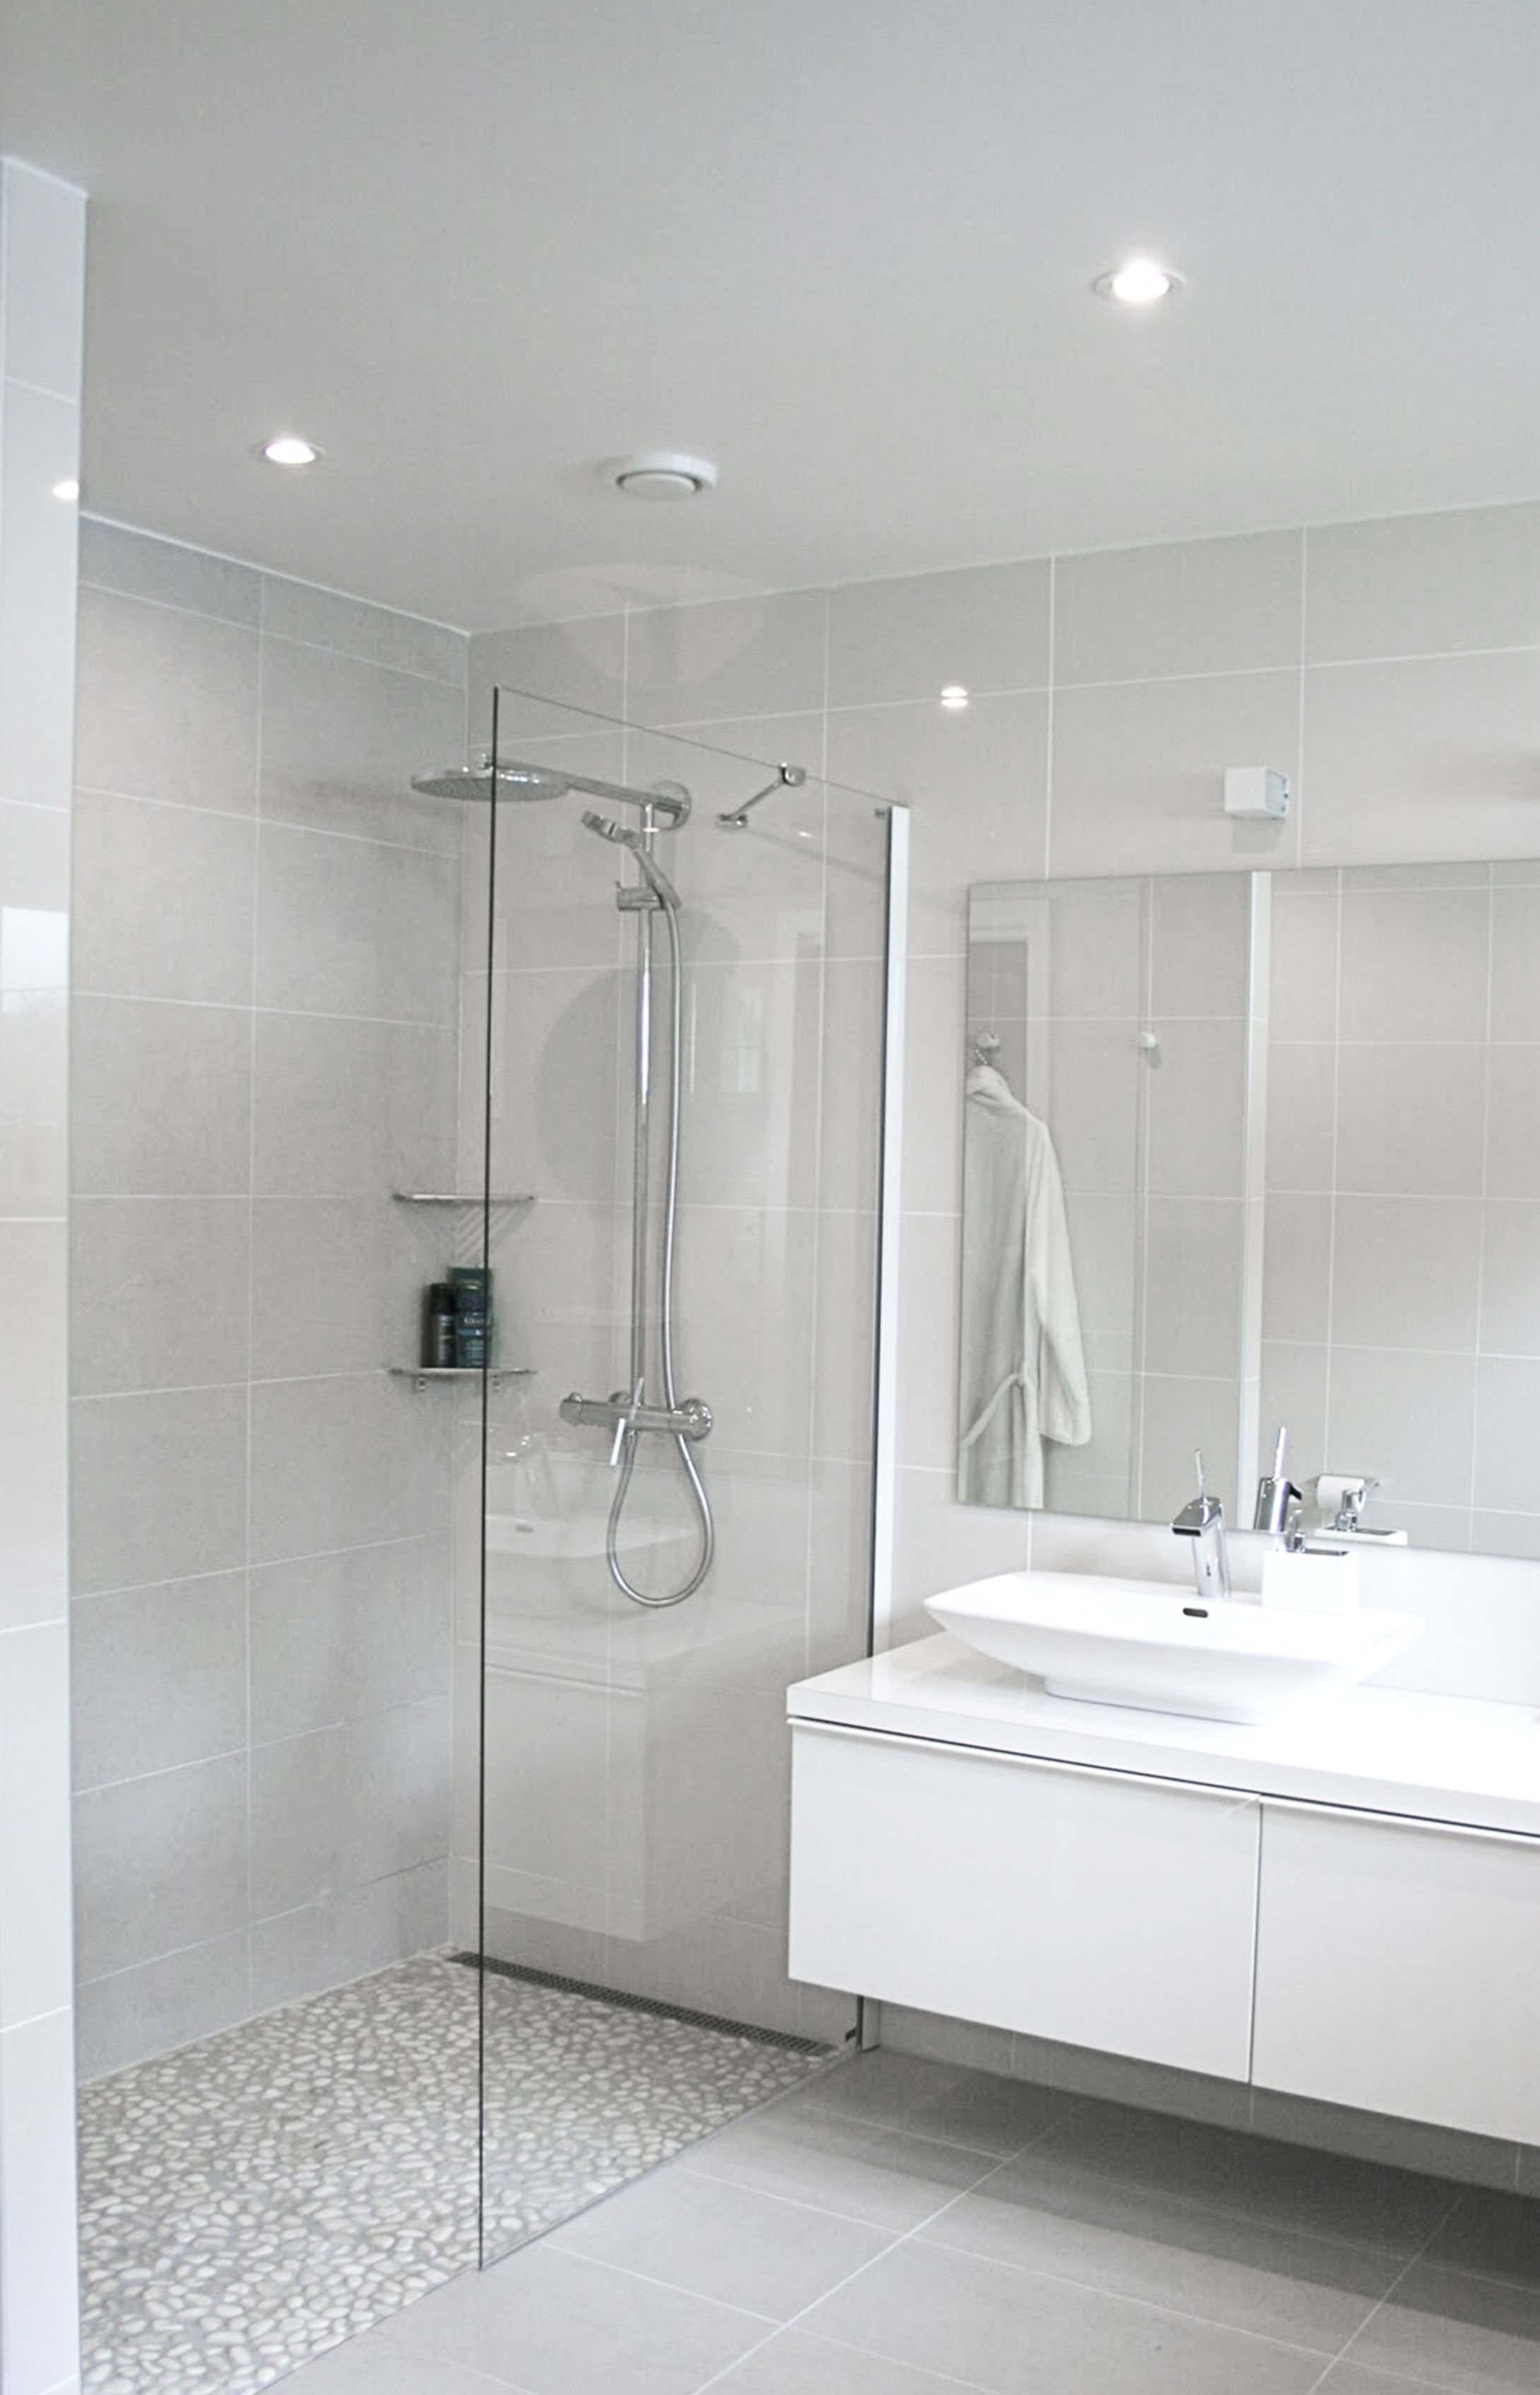 Christine-sveen-bathroom-shower | Badkamer | Pinterest | Minimal ...